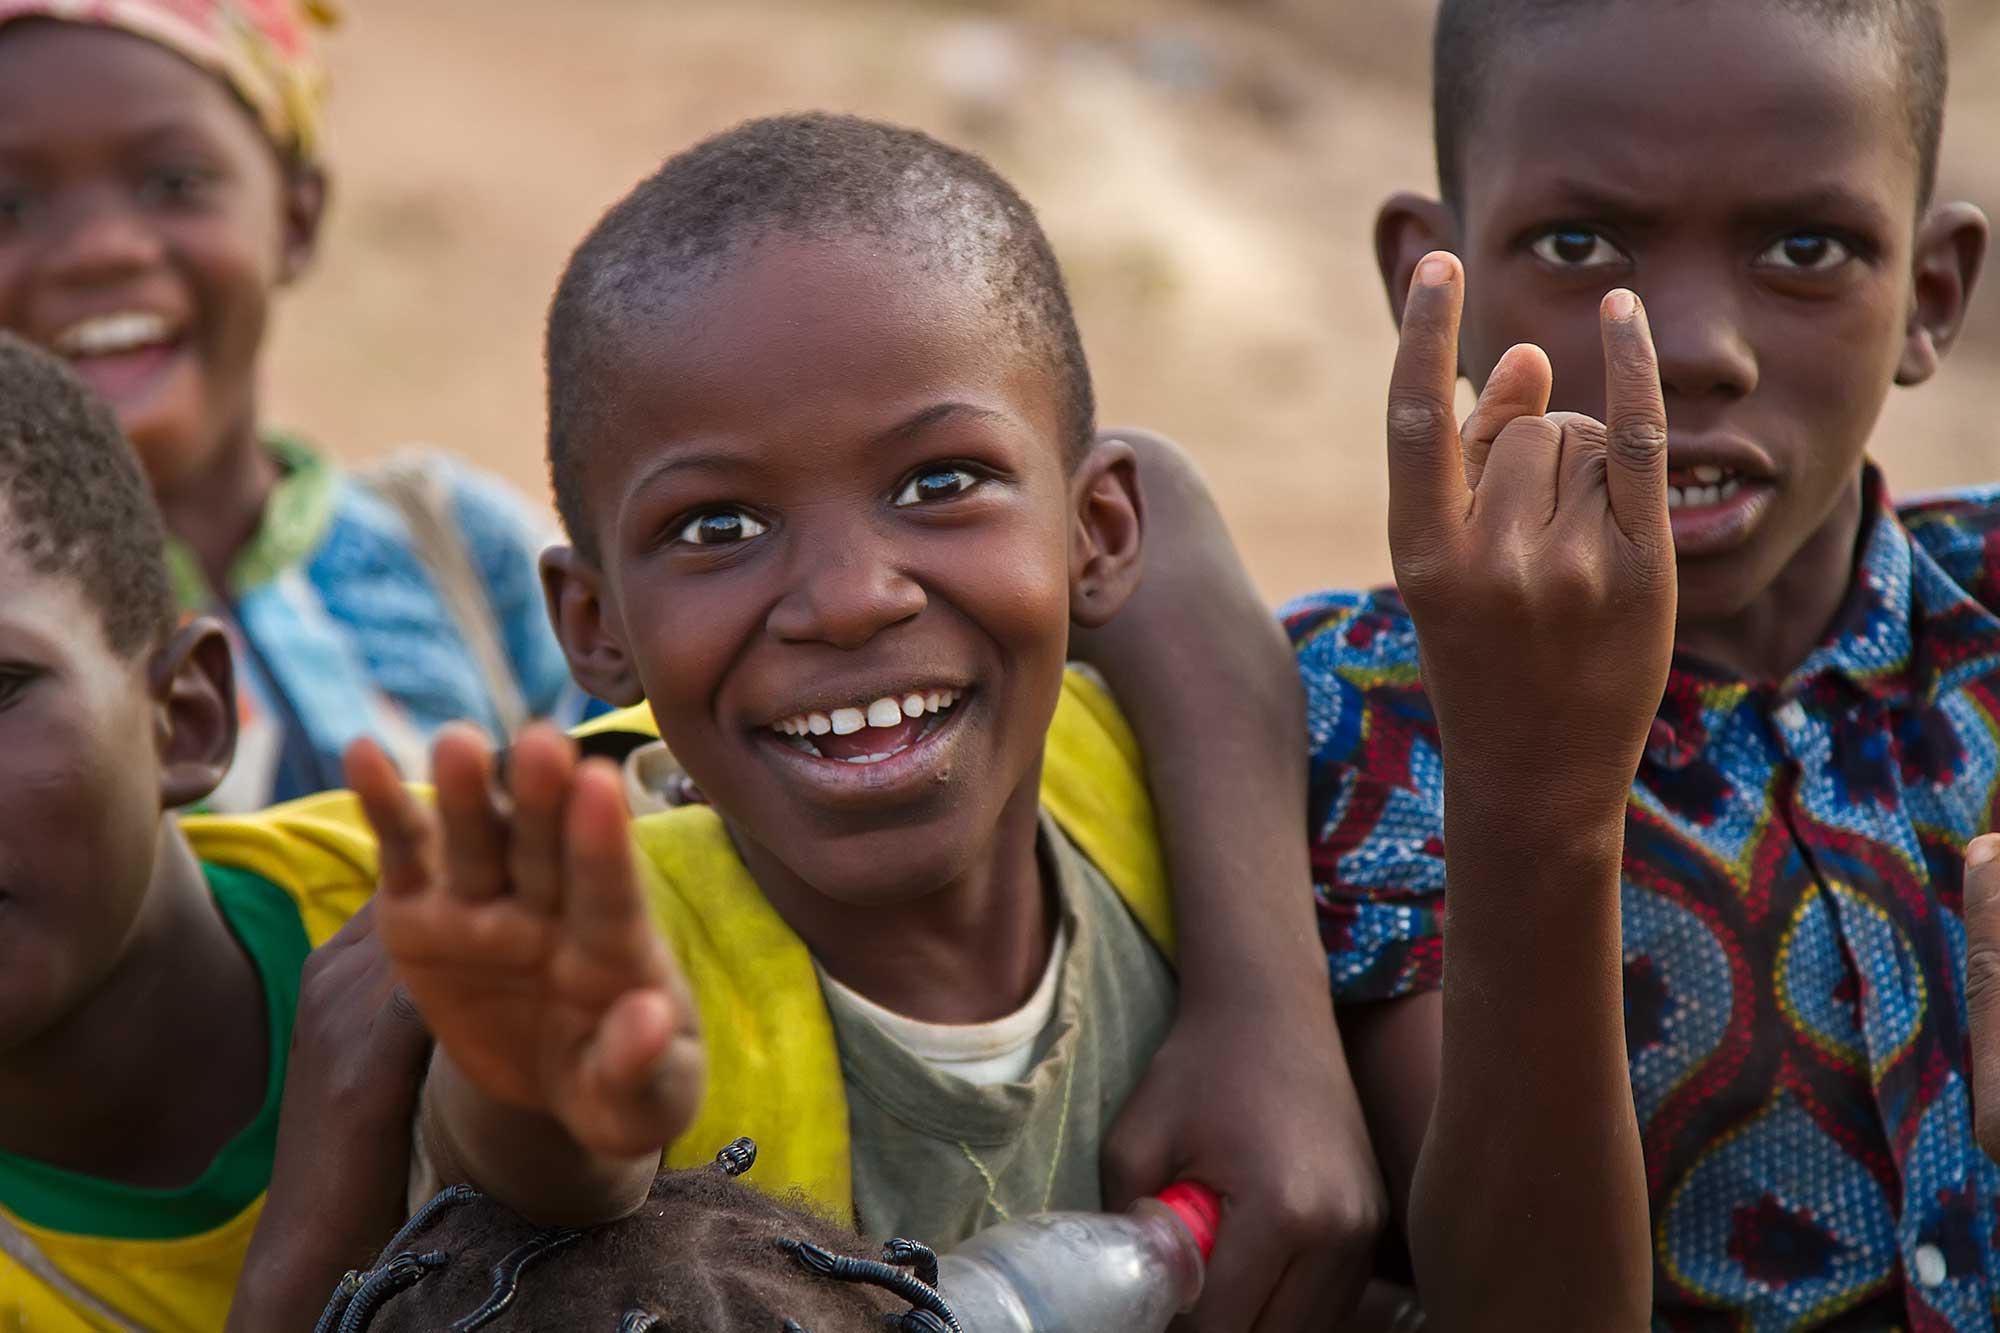 portrait-playing-kids-ouagadougou-burkina-faso-africa